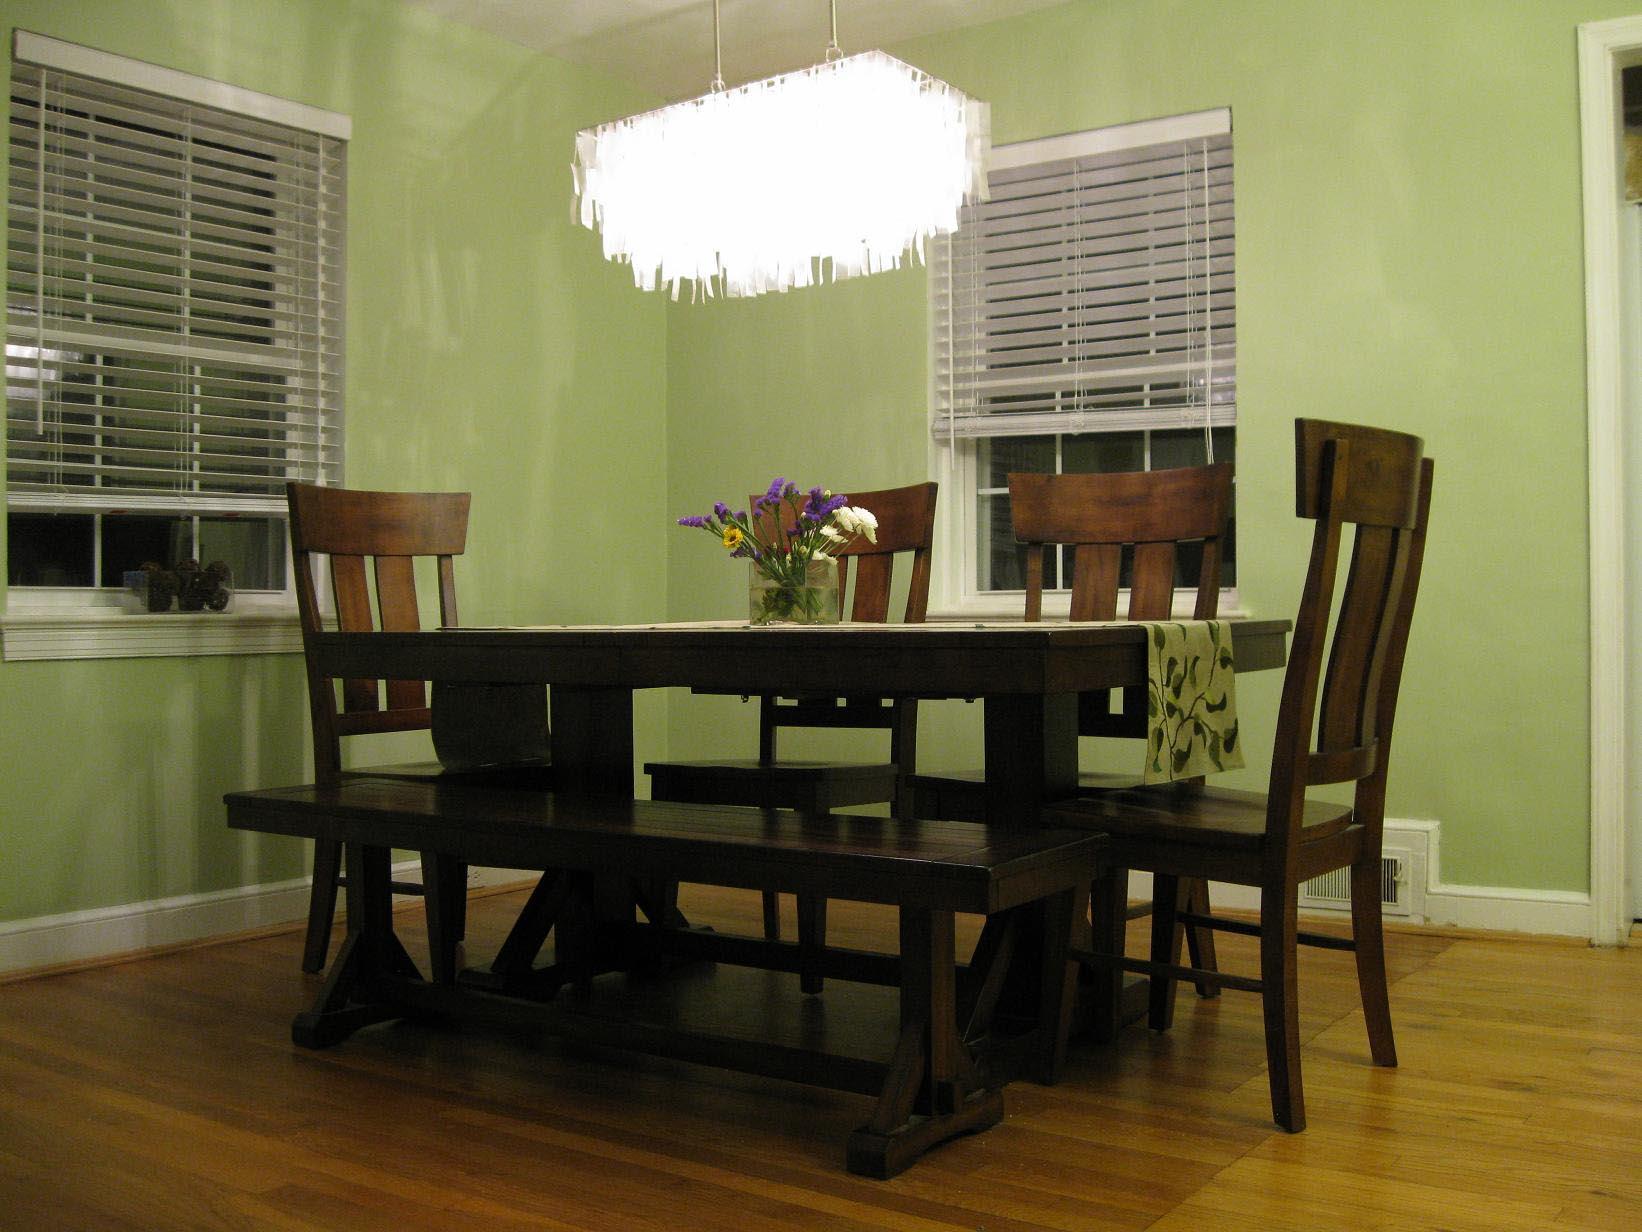 Dining Ceiling Light Fixture